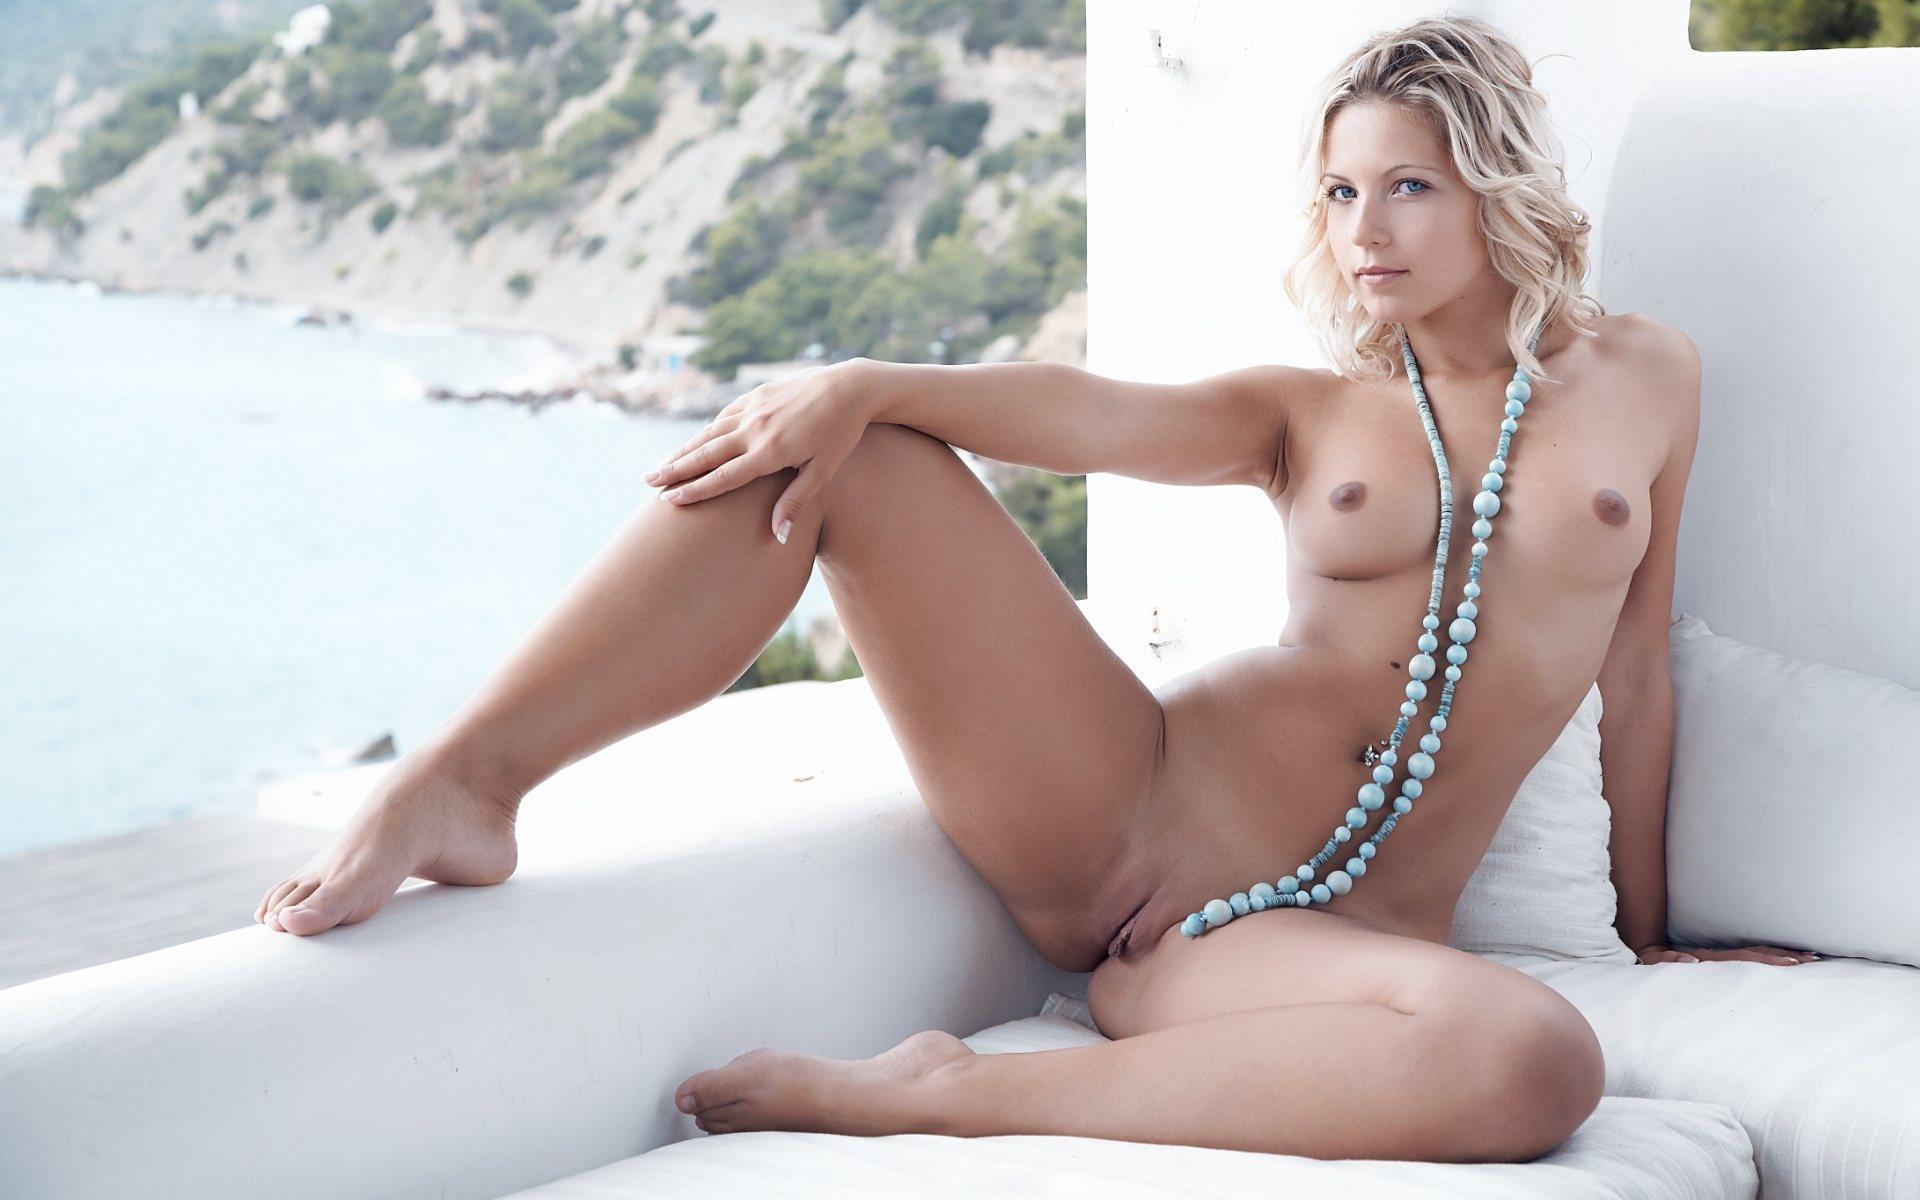 Jenni falconer nude pictures